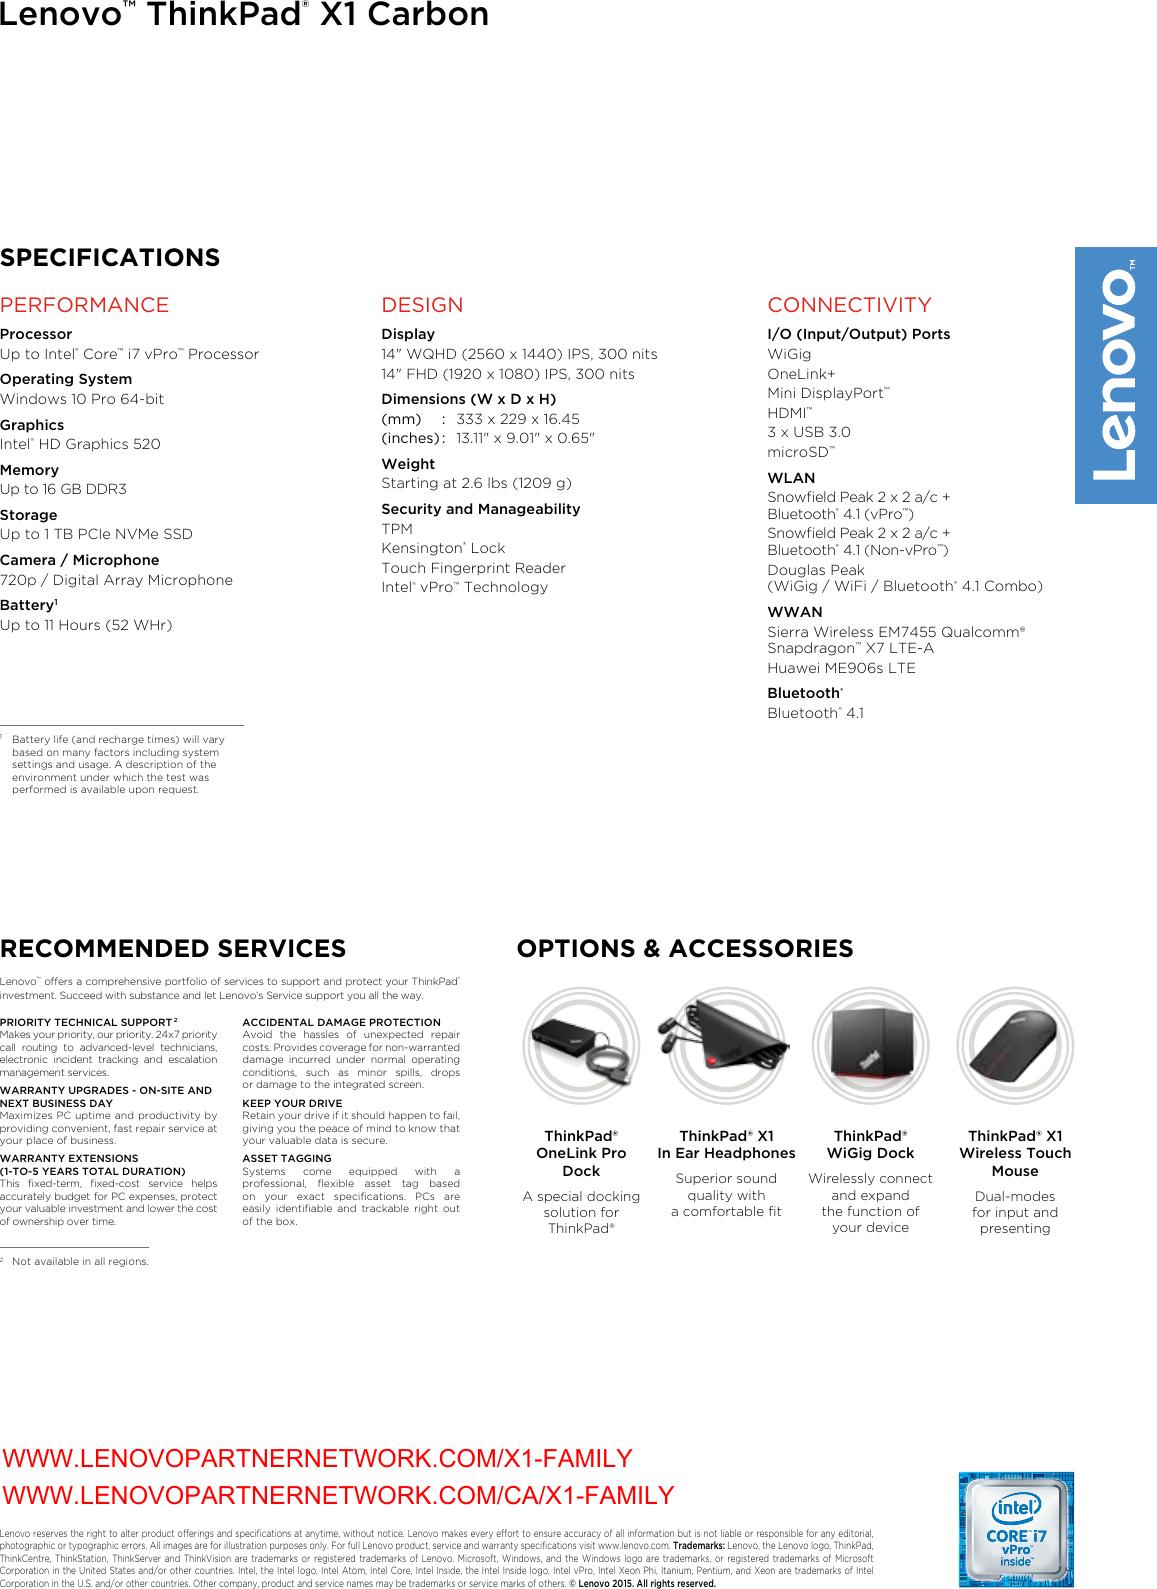 Lenovo ThinkPad X1 Carbon_DS Datasheet carbon 4th gen